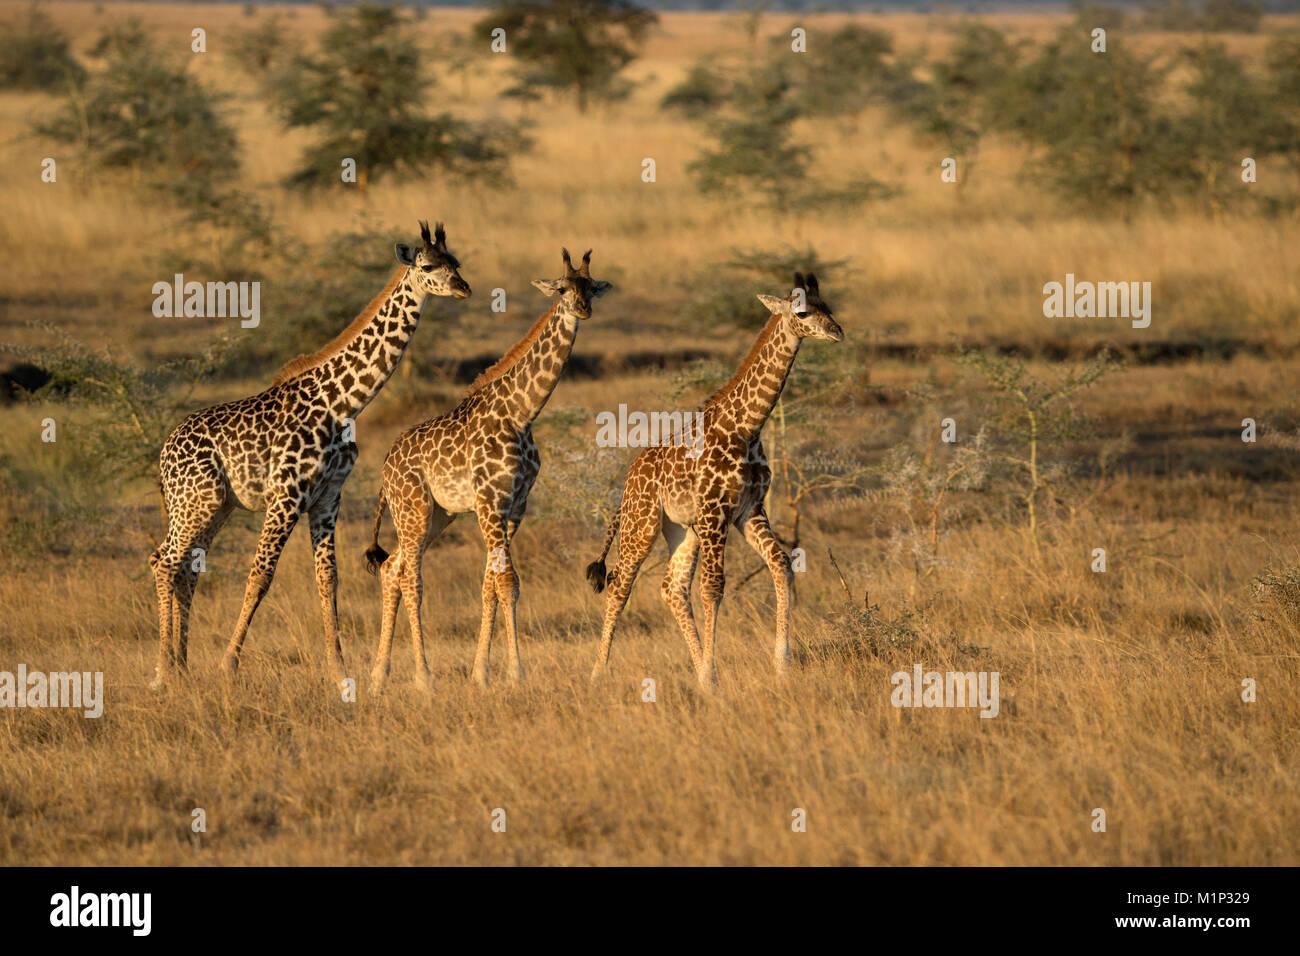 Les jeunes girafes (Giraffa camelopardalis), Parc National de Serengeti, Tanzanie, Afrique orientale, Afrique du Photo Stock